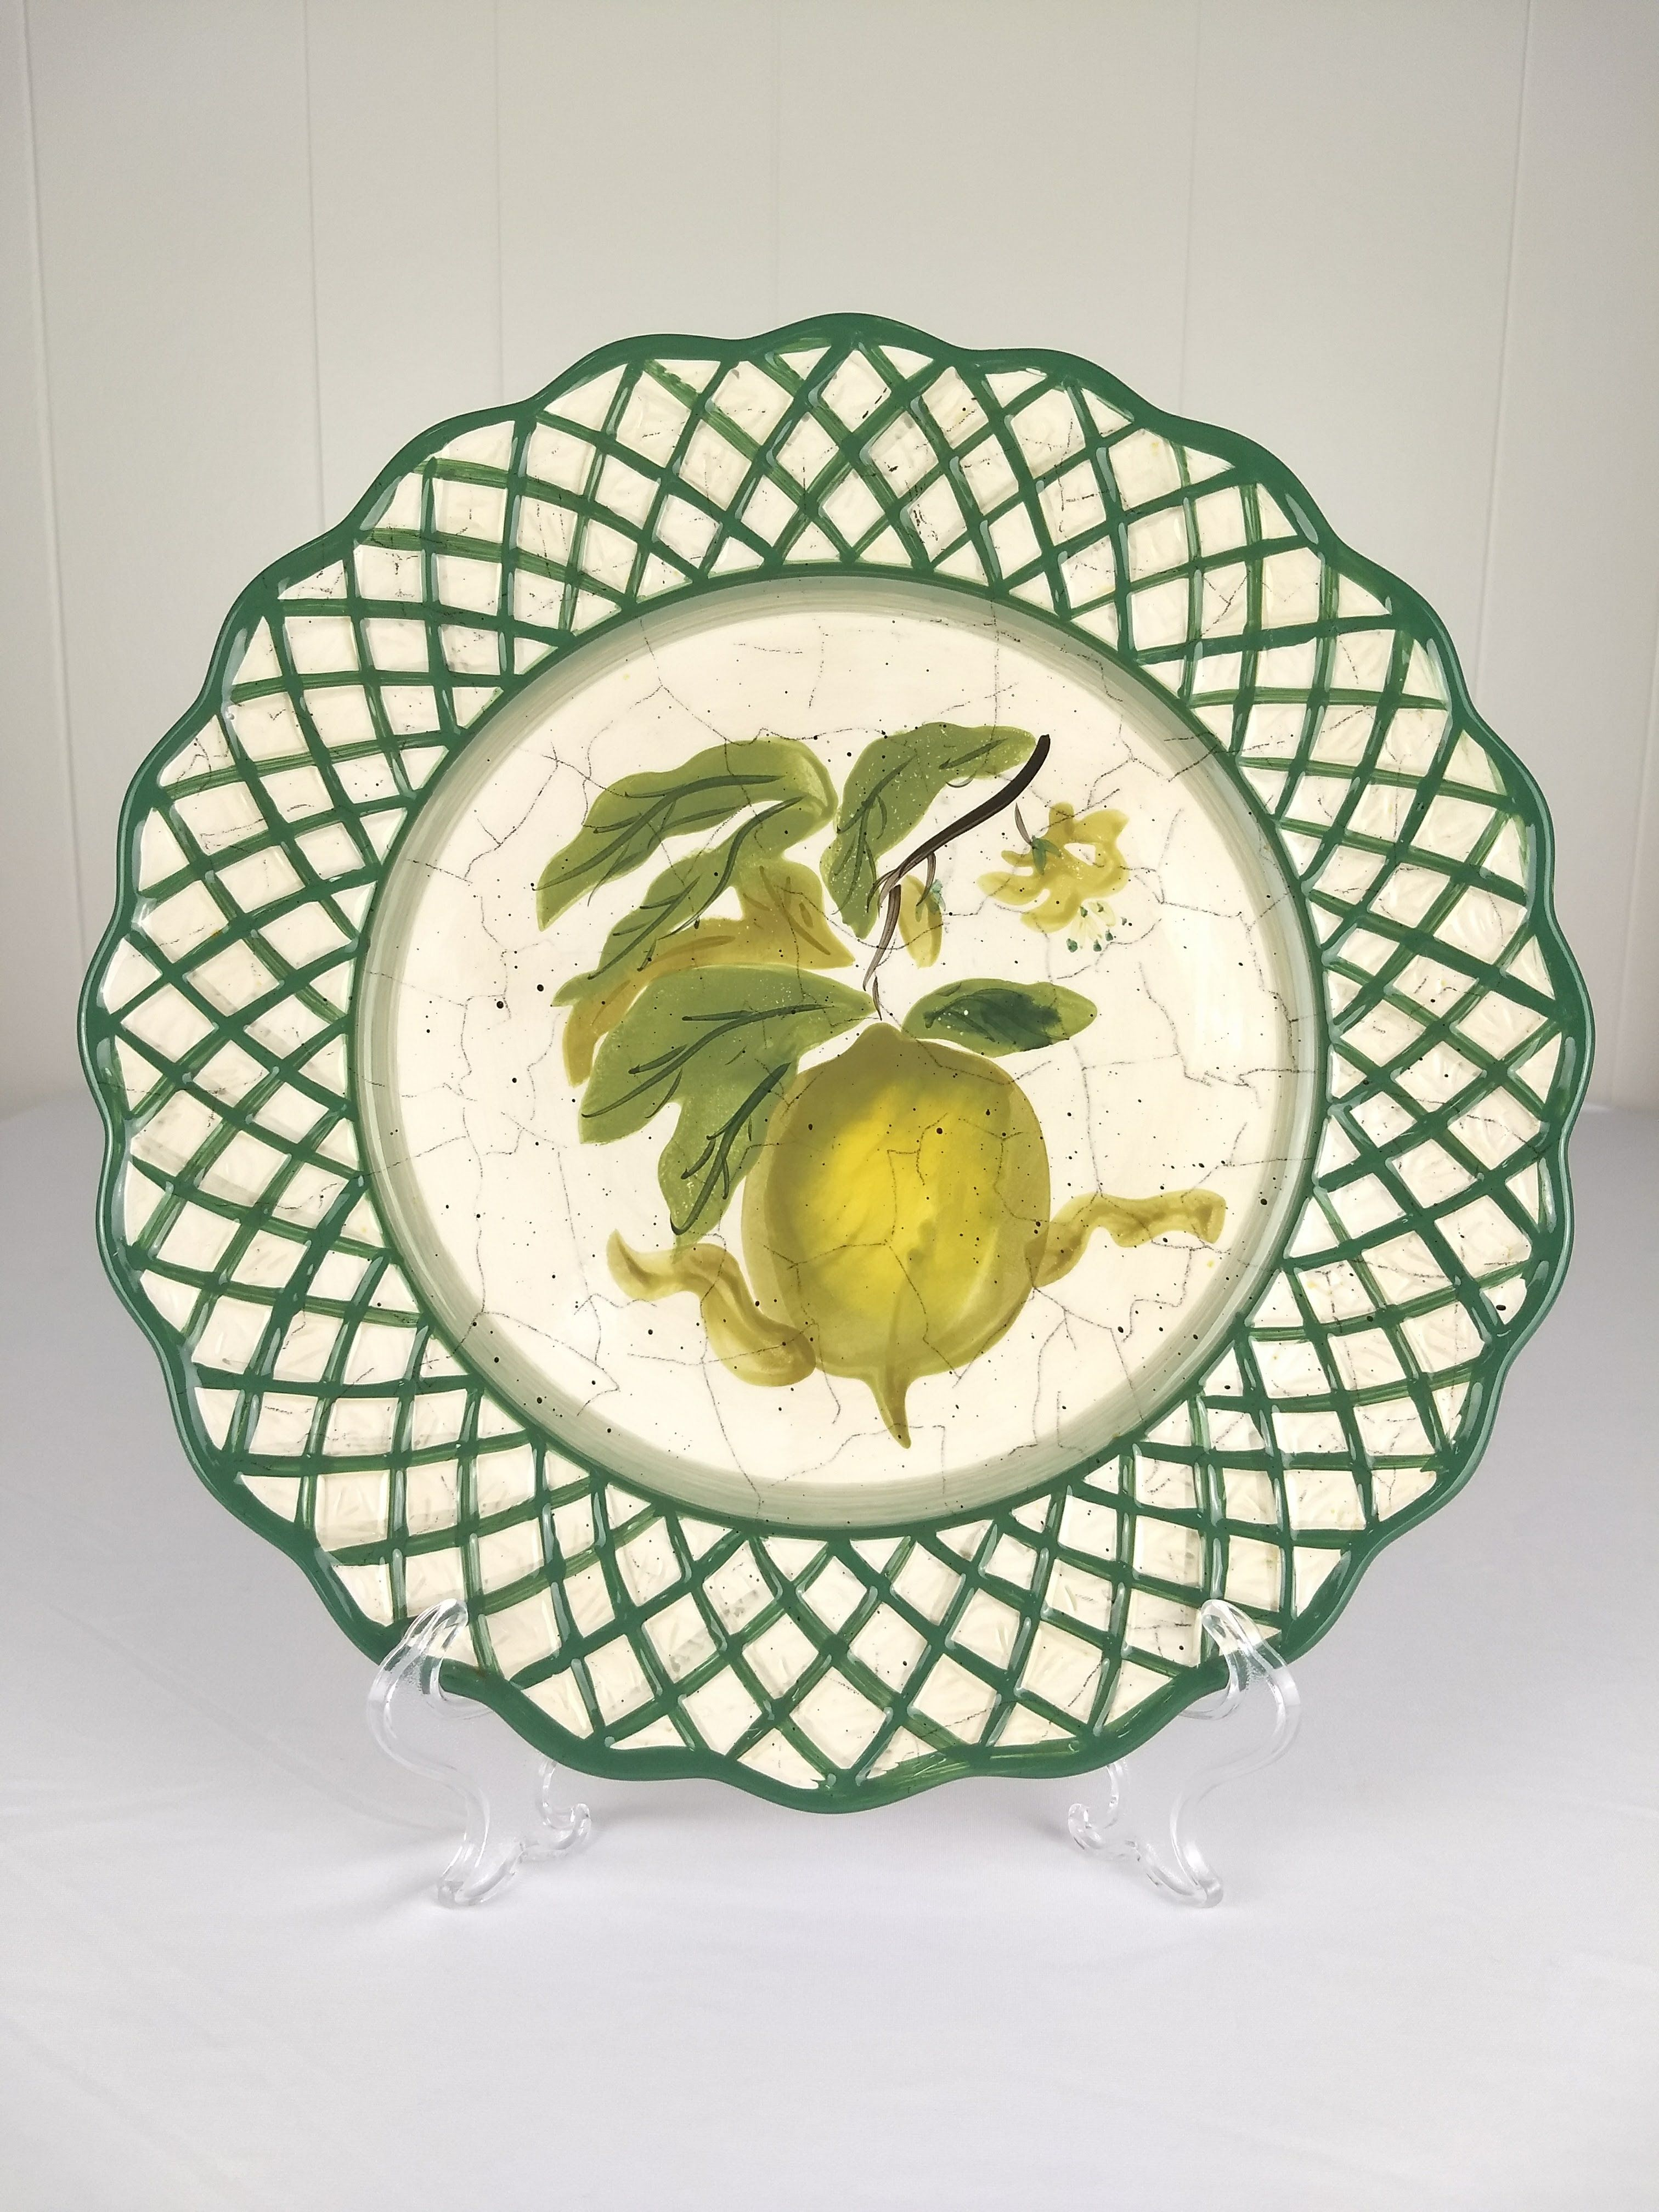 Raymond Waites Cornucopia Lemon Dinner Plate measures 11\  in diameter #collector #collectorplate & Raymond Waites Cornucopia Lemon Dinner Plate measures 11\